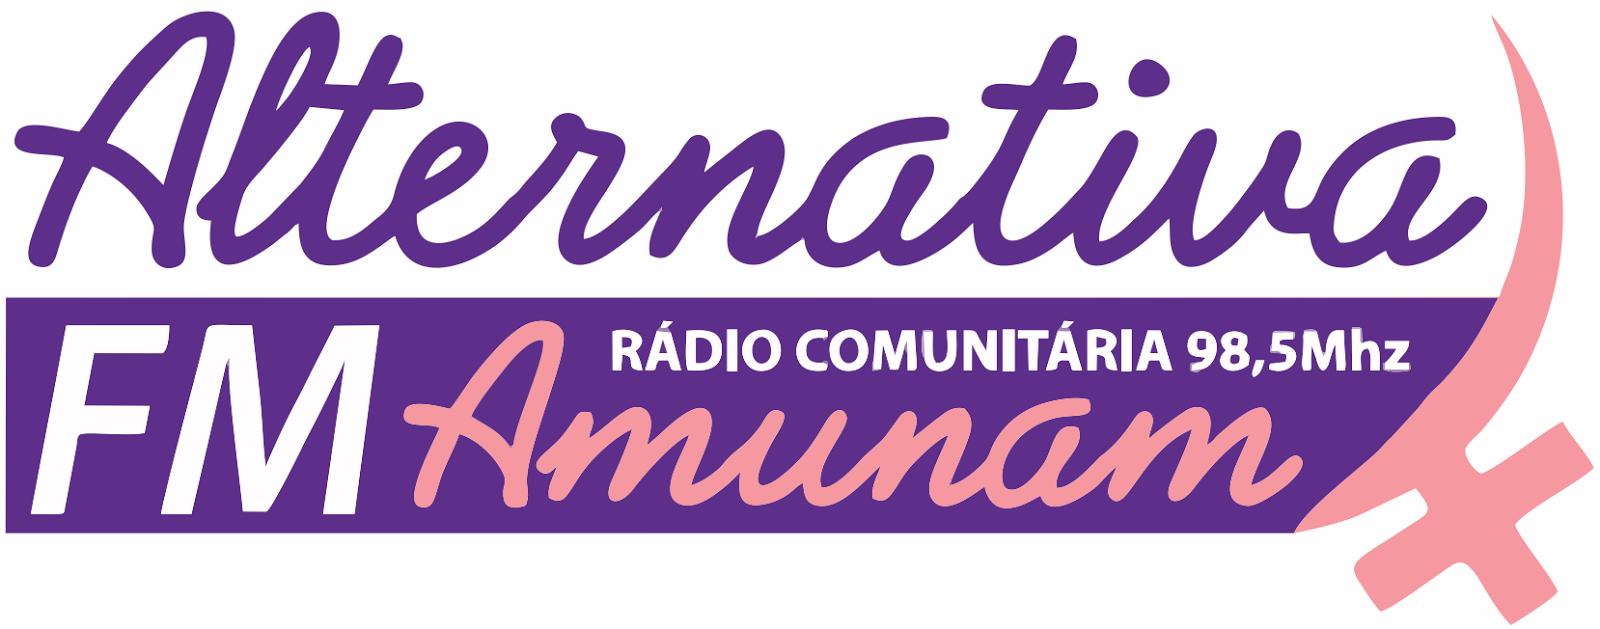 Comunicado da r dio alternativa fm blog amunam r dio for Radio boden 98 2 mhz